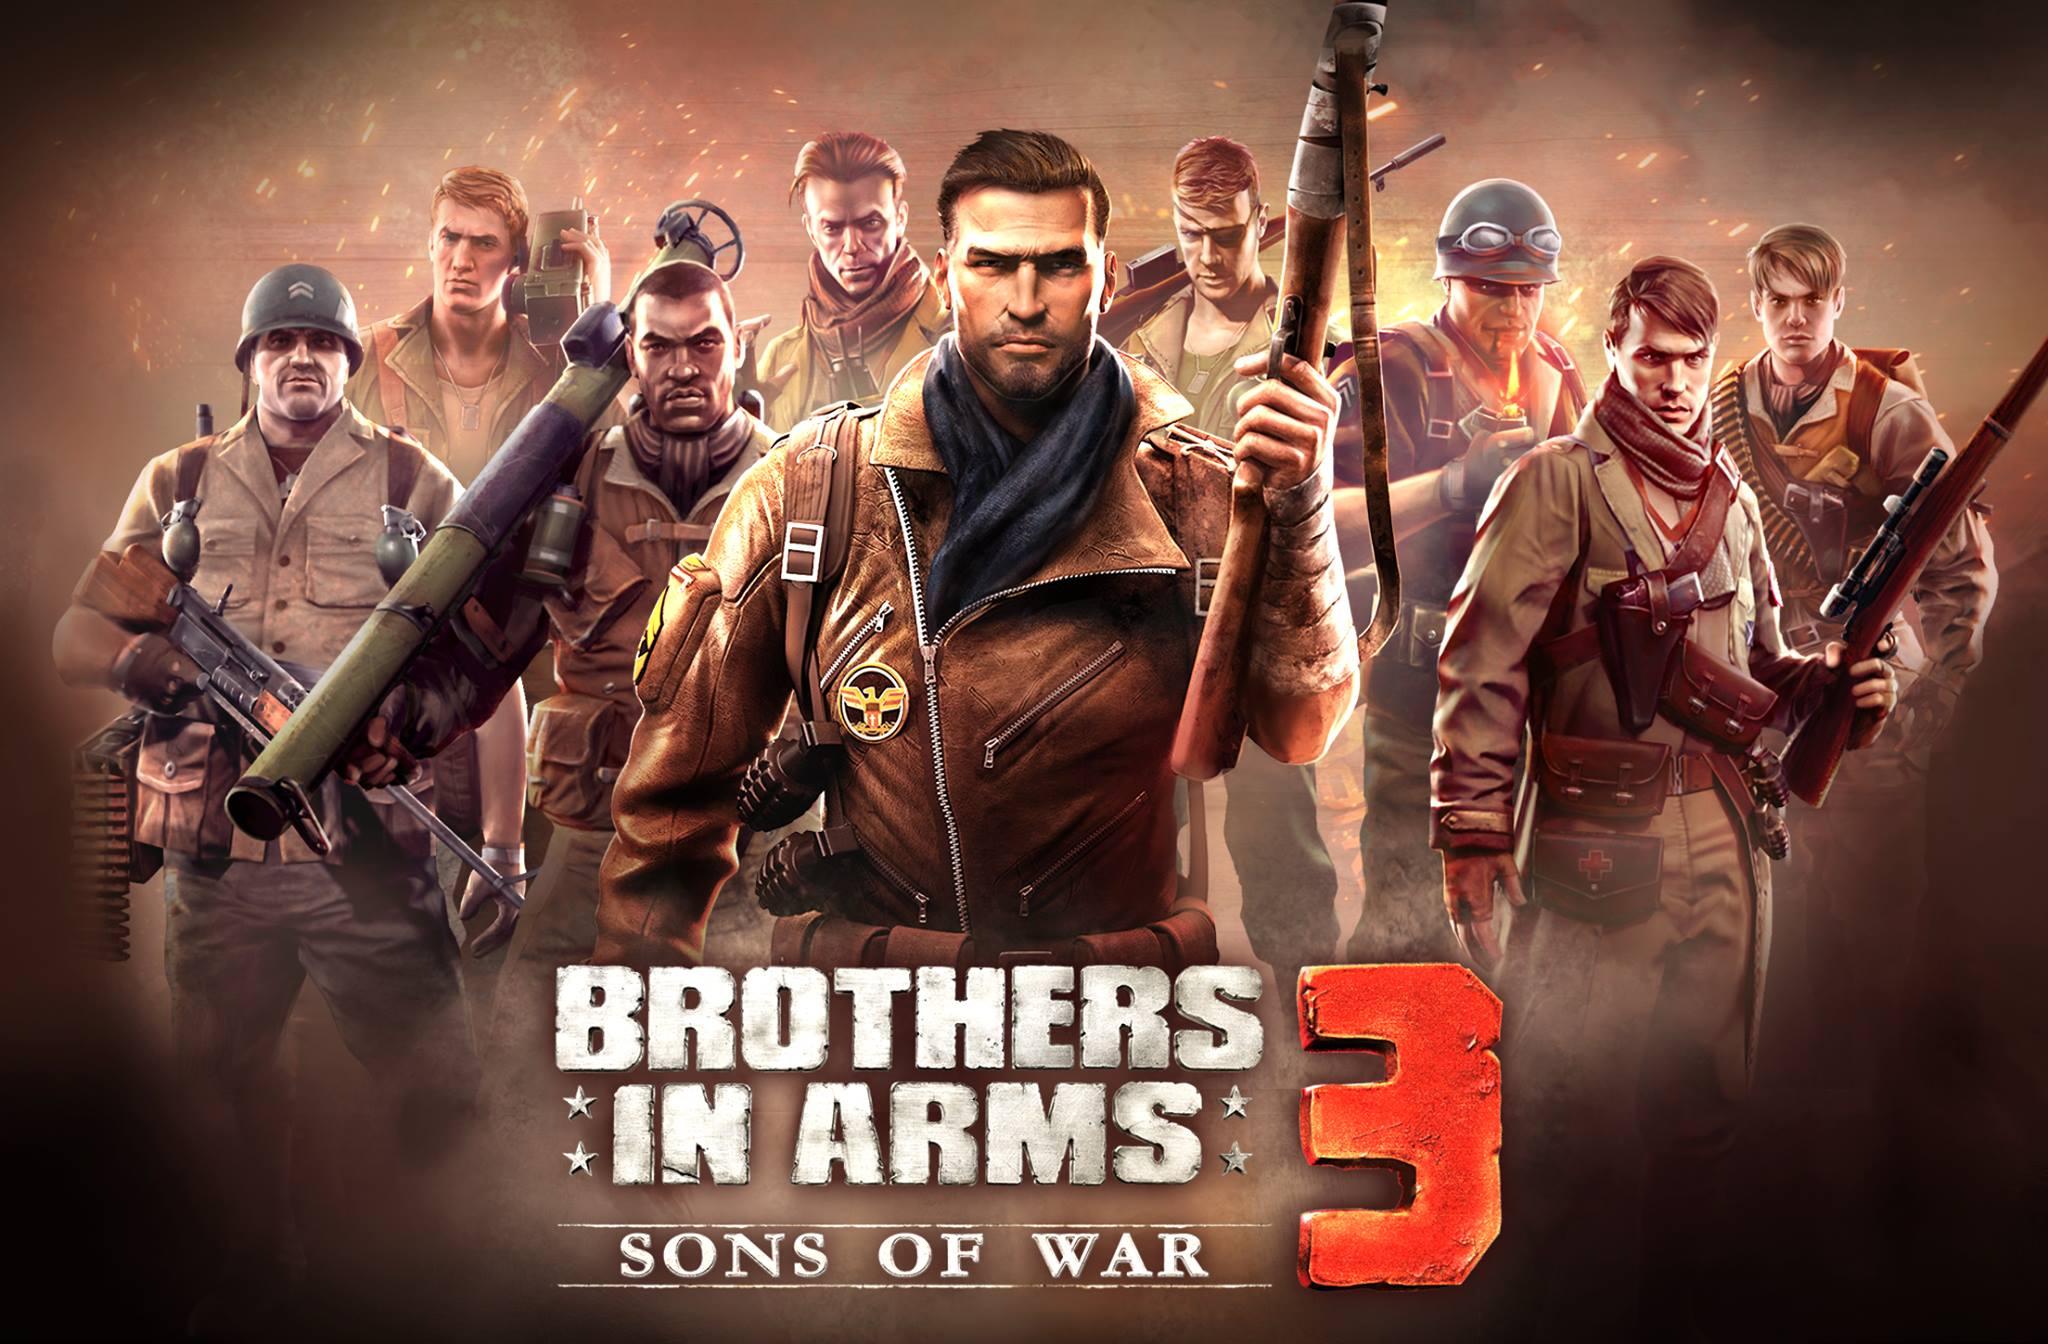 Brothers in Arms 3 : Sons of War se dévoile dans un trailer